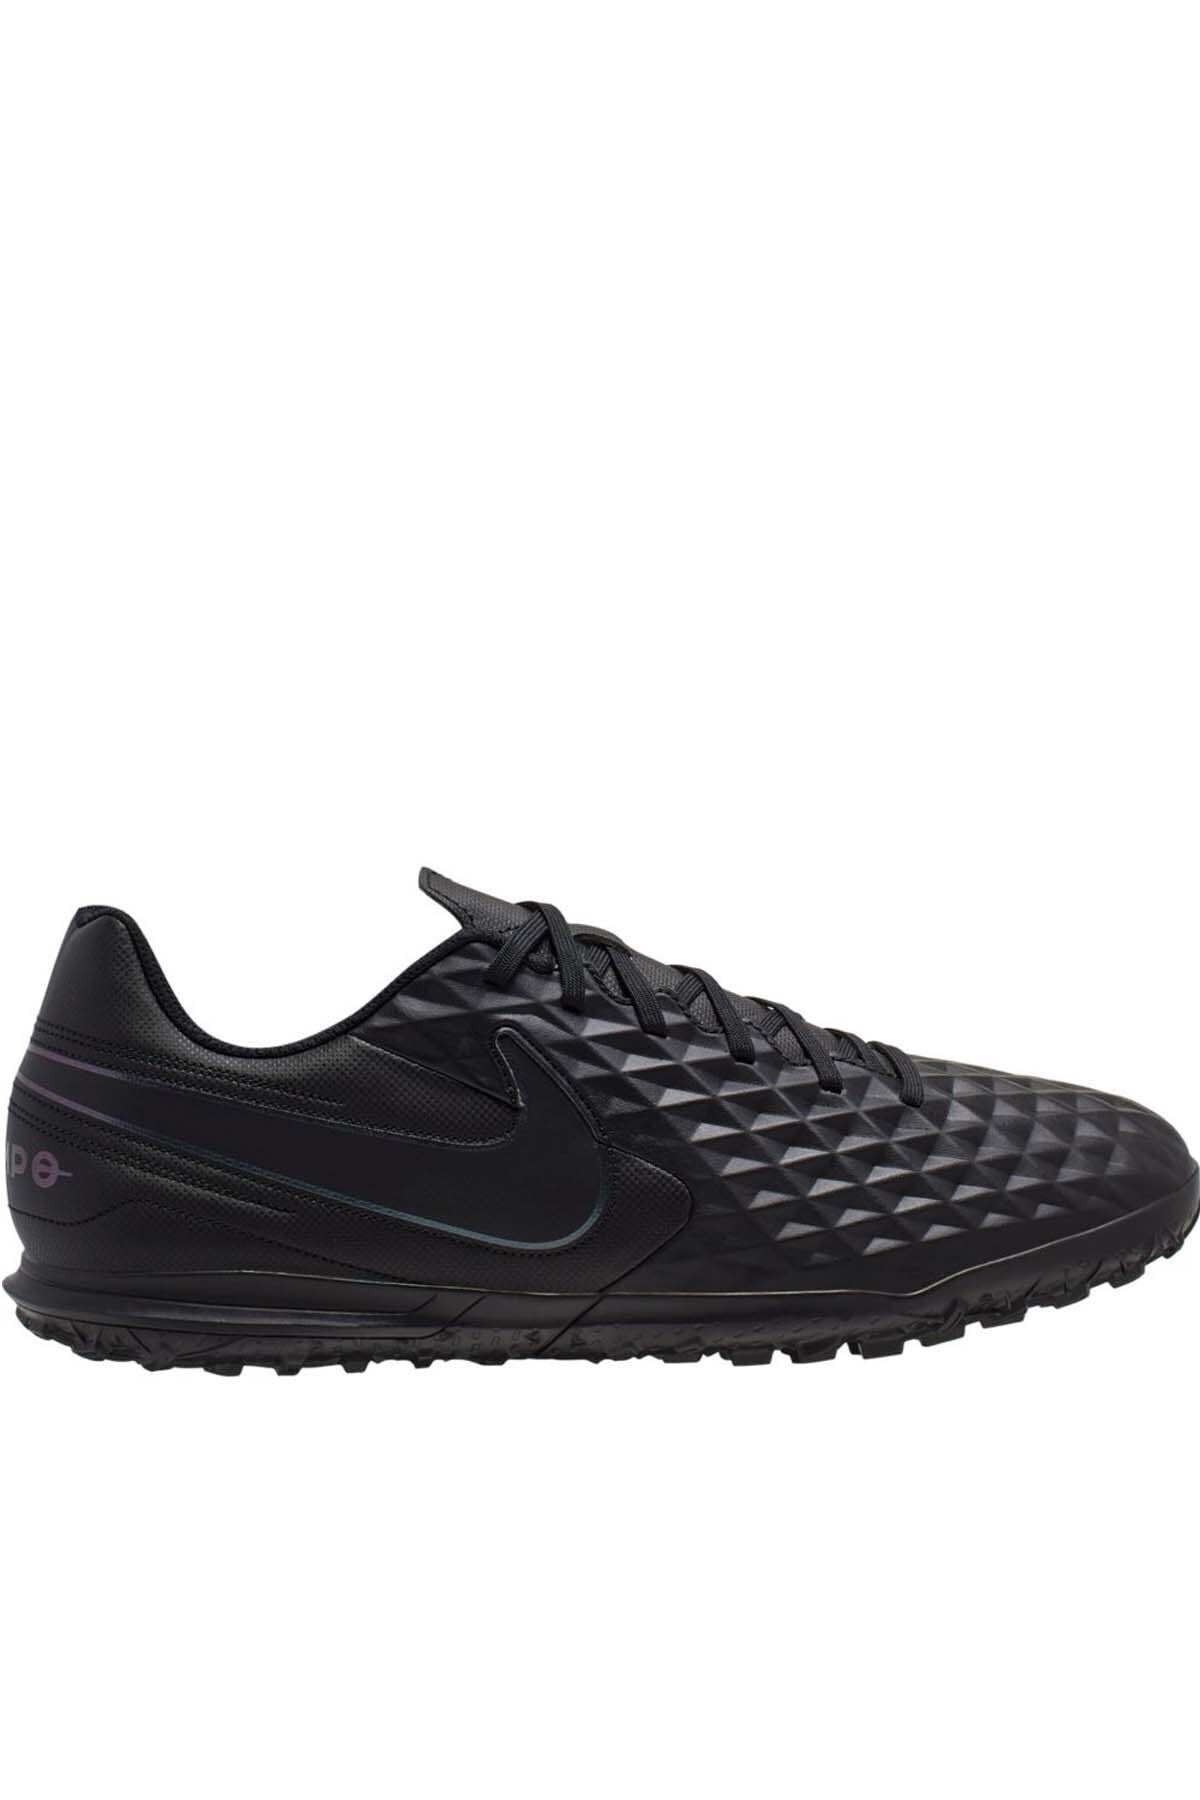 خرید نقدی کفش فوتبال مردانه ترک مارک Nike رنگ مشکی کد ty35817609